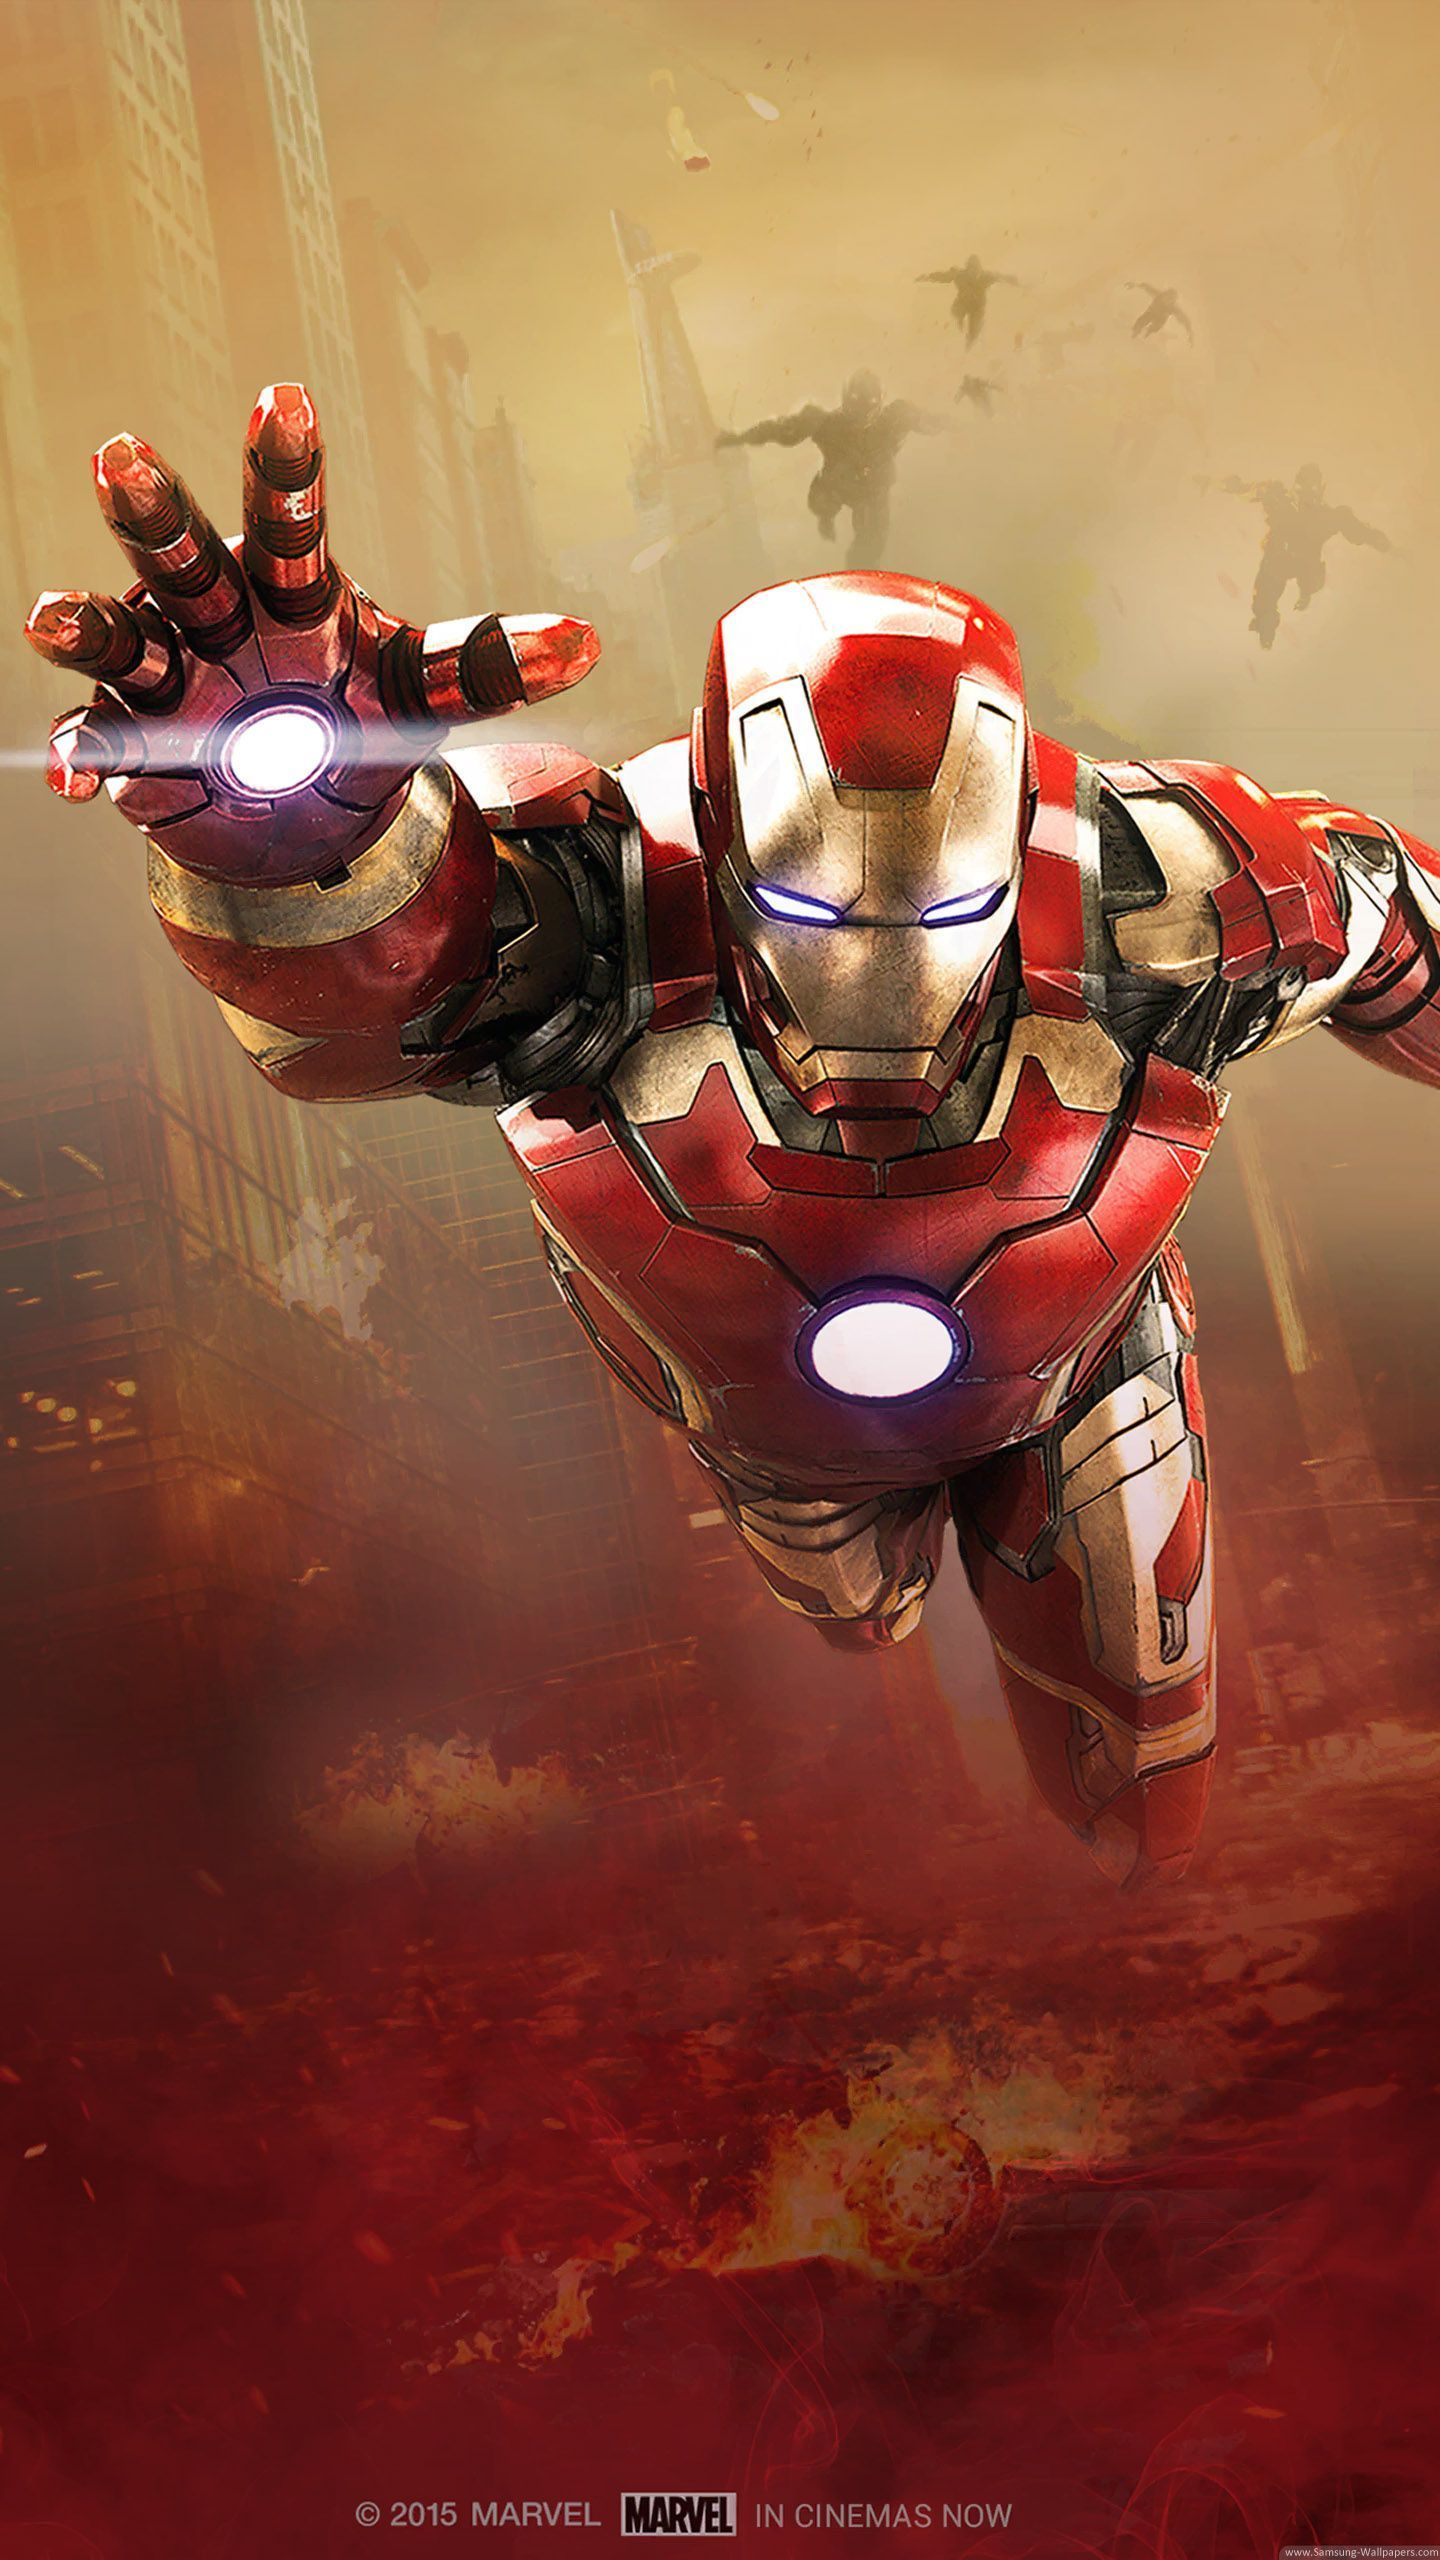 Iron Man Phone Wallpapers Top Free Iron Man Phone Backgrounds Wallpaperaccess